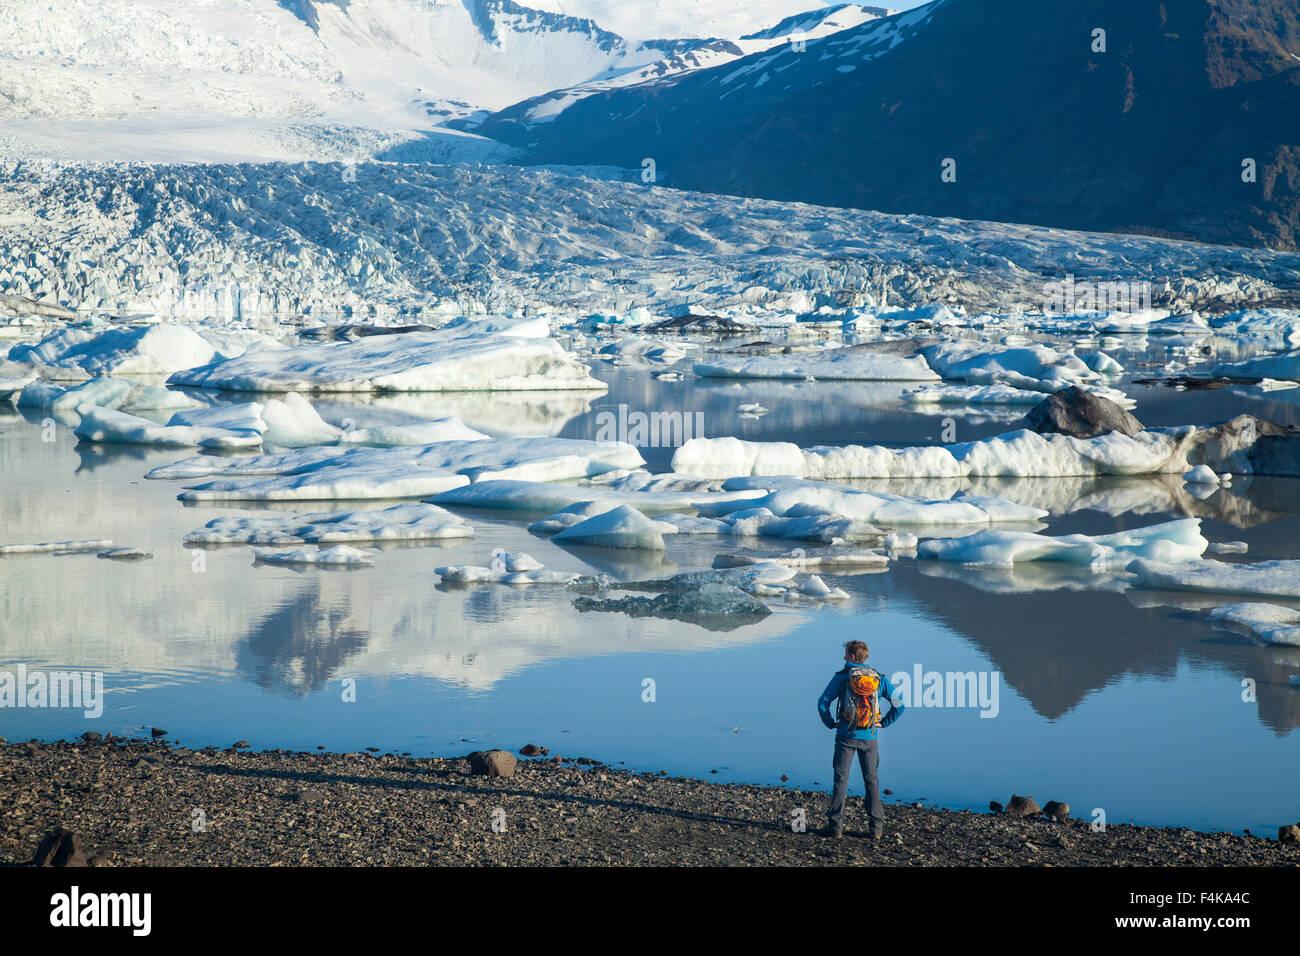 Persona accanto a Fjallsarlon laguna iceberg, al di sotto del ghiacciaio Fjallsjokull. Vatnajokull National Park, Immagini Stock